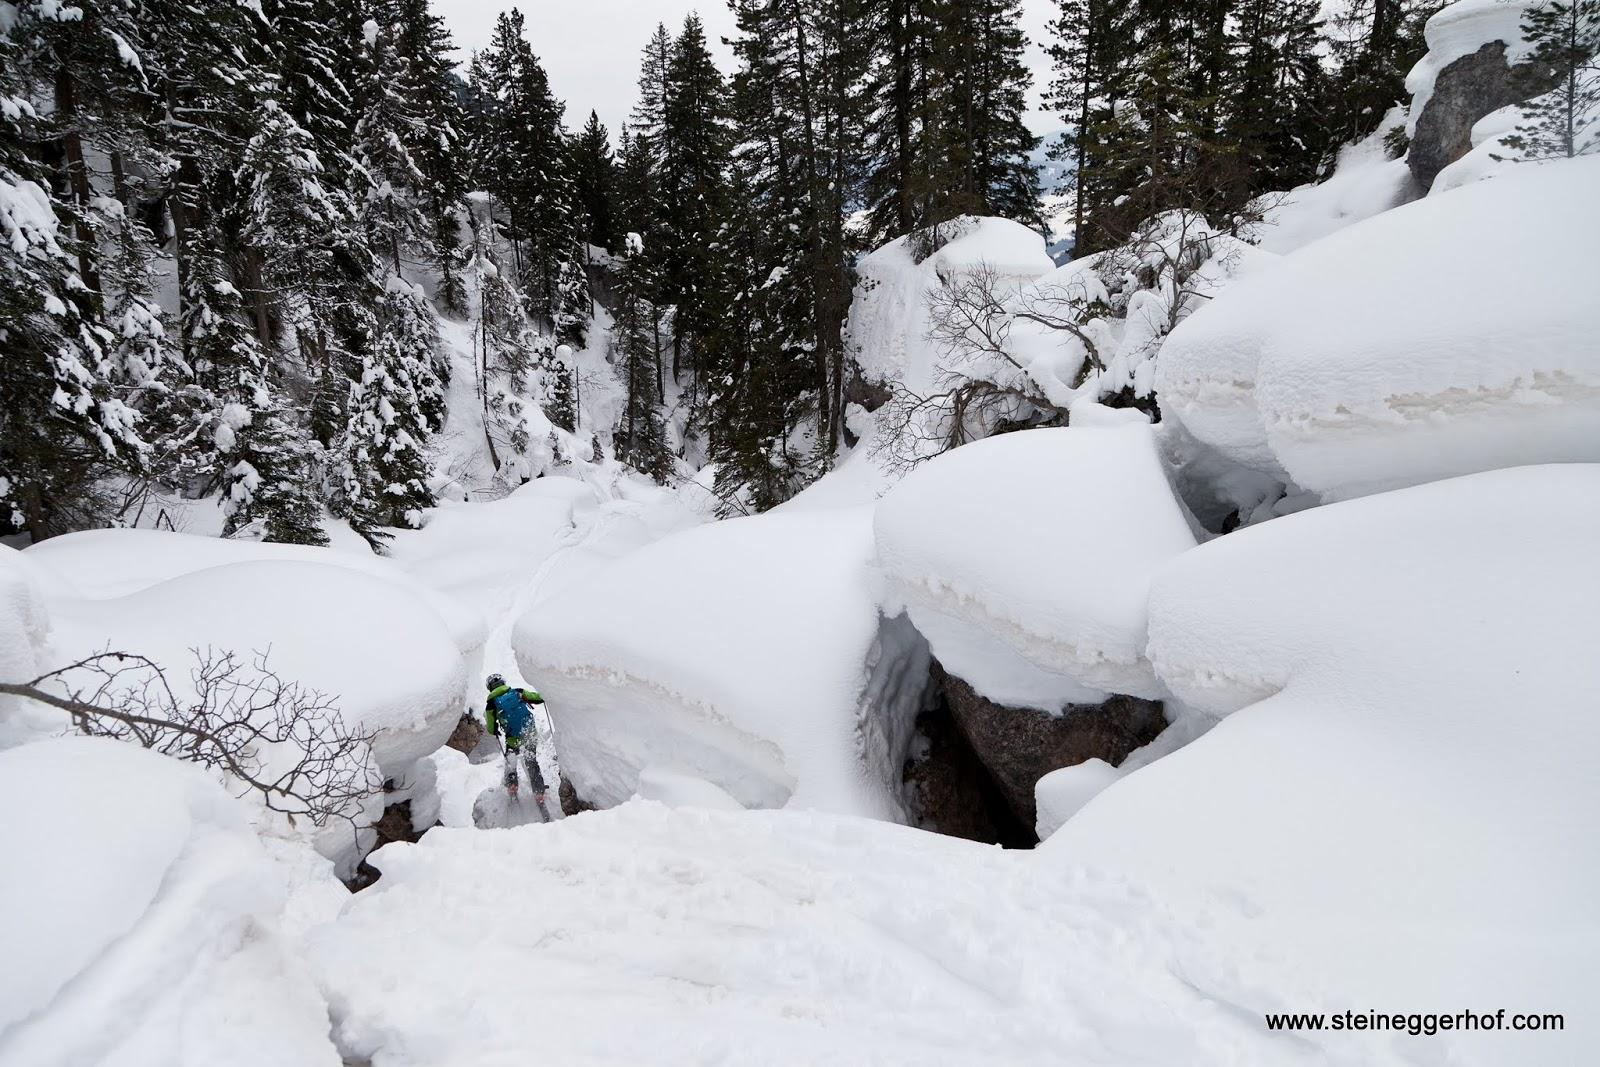 http://www.steineggerhof.com/de/hotelinformationen/fotogalerie/skitour-villnoesstal-28-02-14-id-5985389623448970849.html